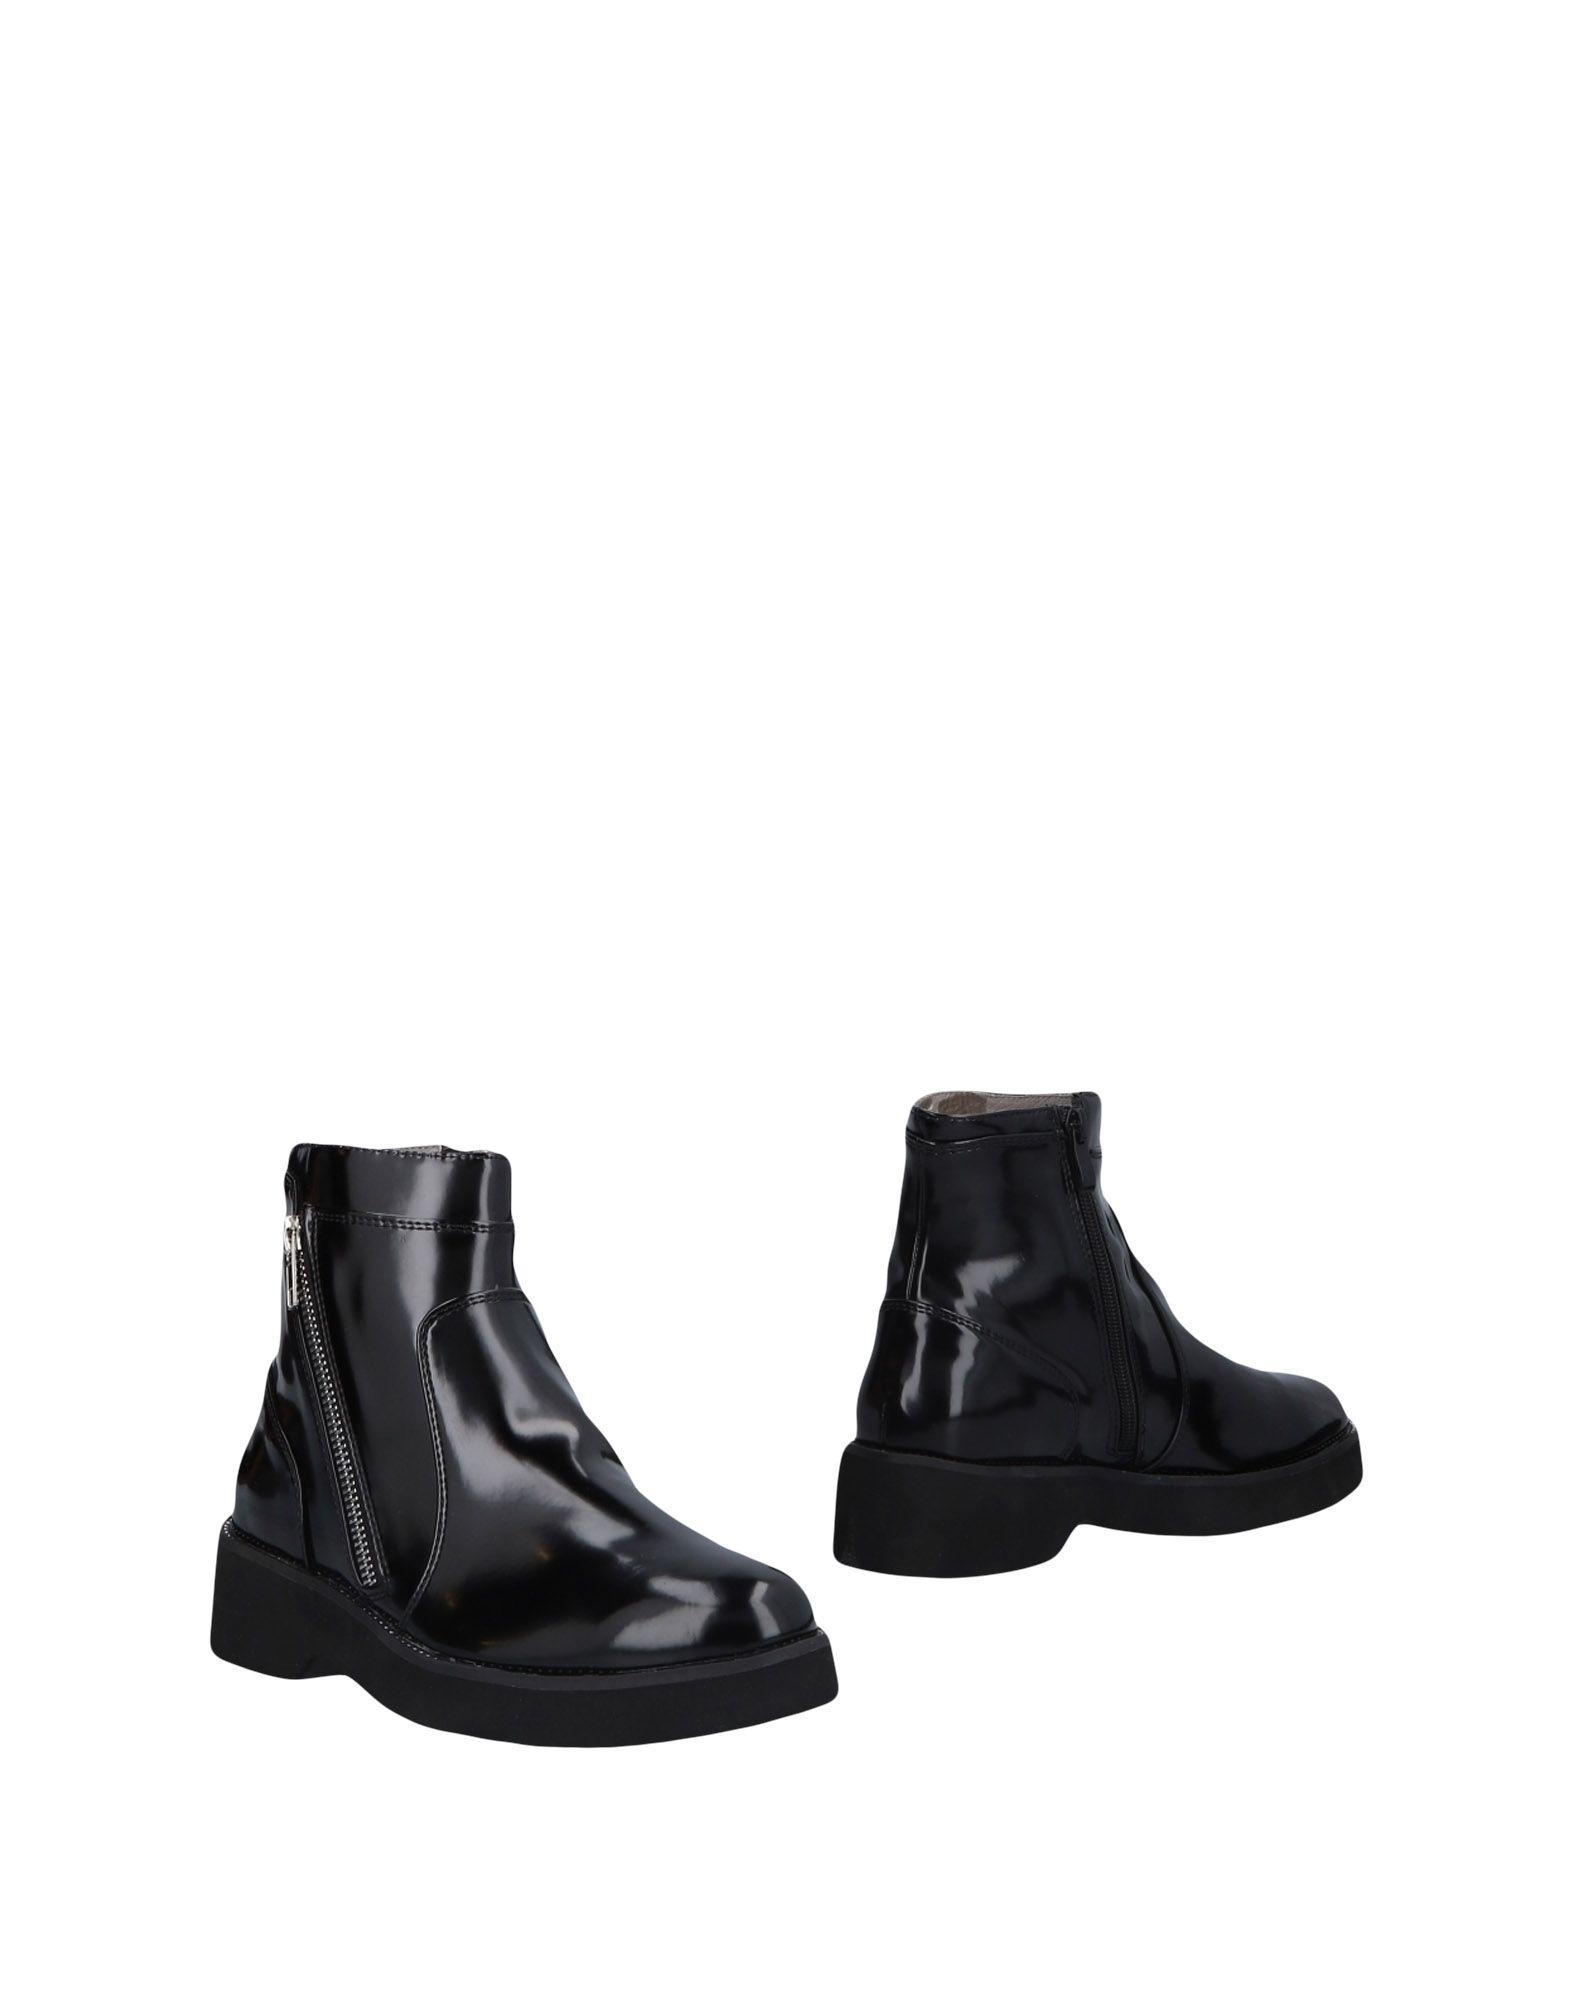 Cafènoir Stiefelette Damen  11477879PS Gute Qualität beliebte Schuhe